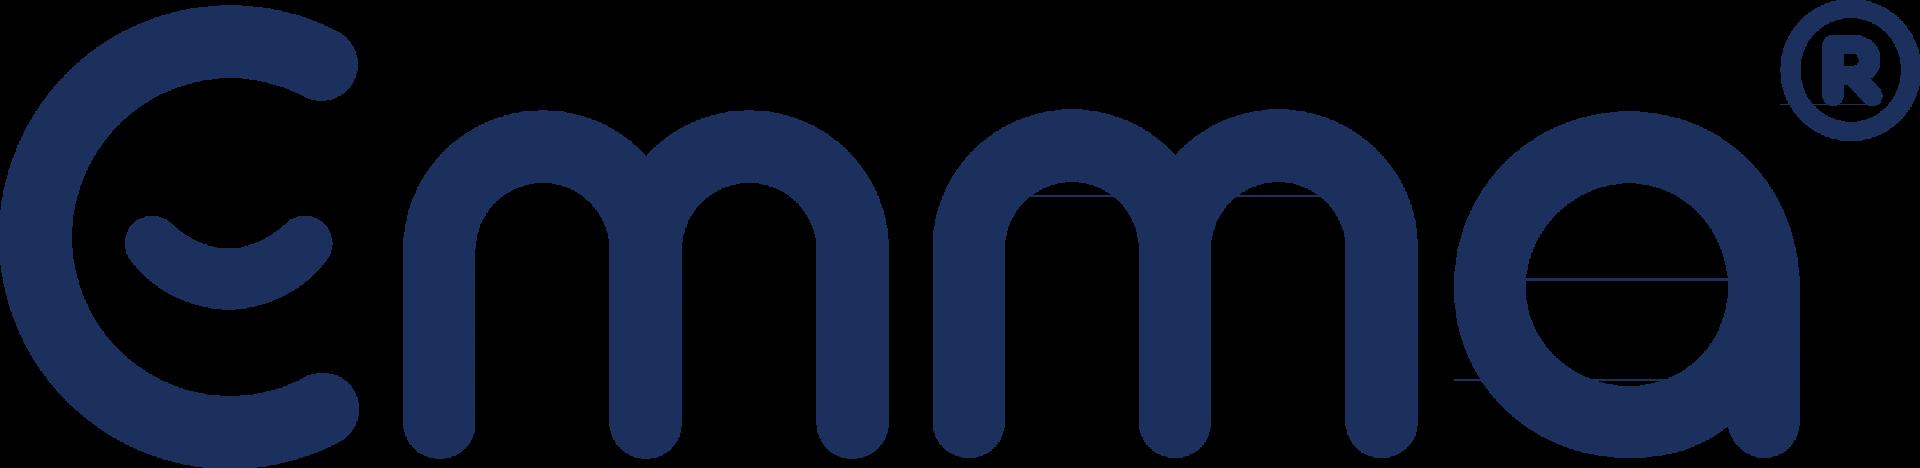 emma-logo-r-blue-rgb-large-1.png